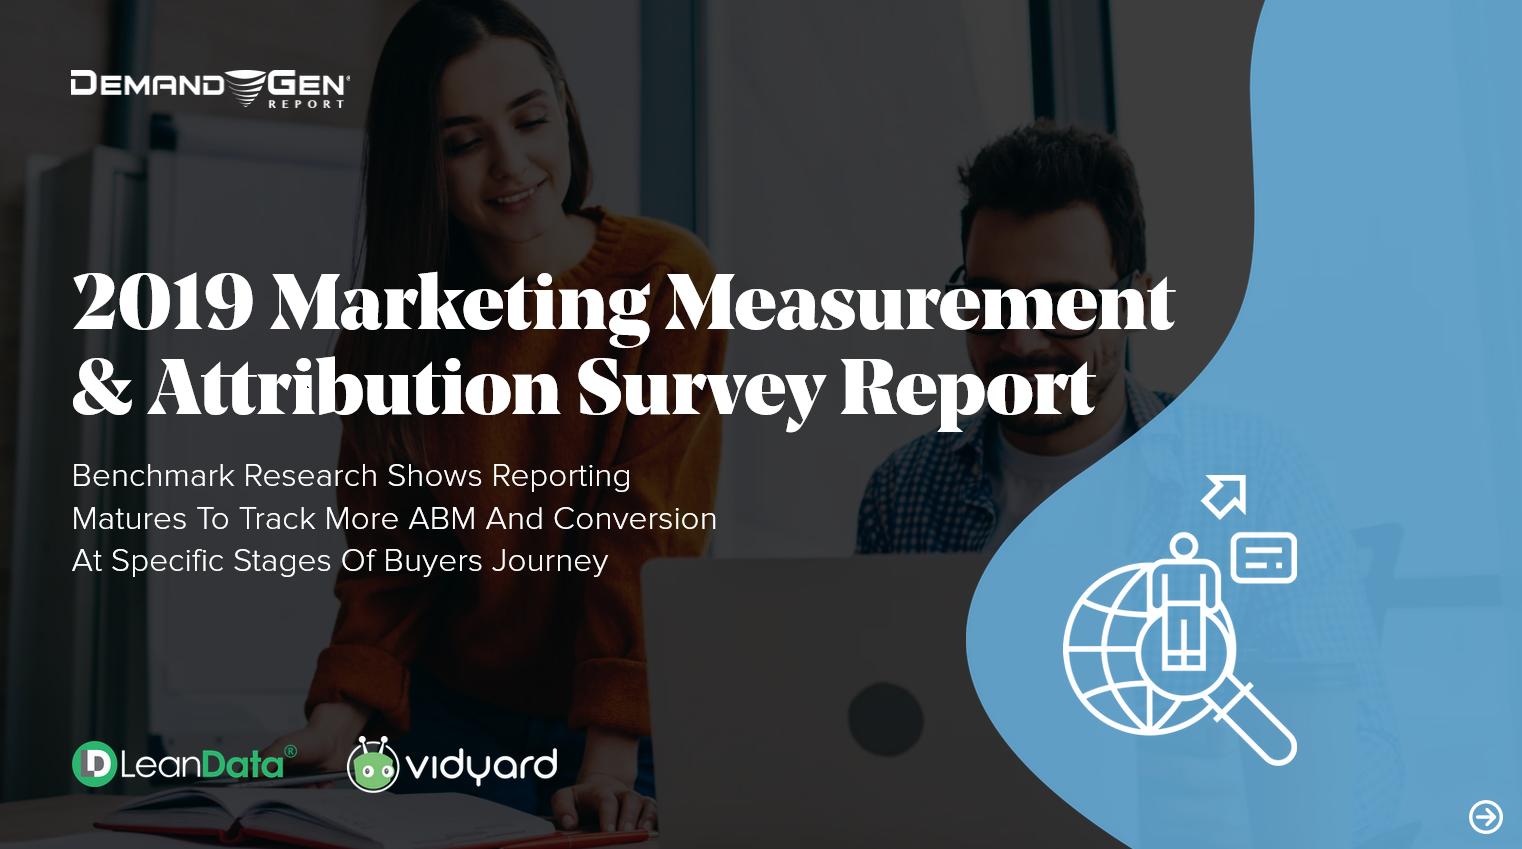 2019 Marketing Measurement and Attribution Survey Report